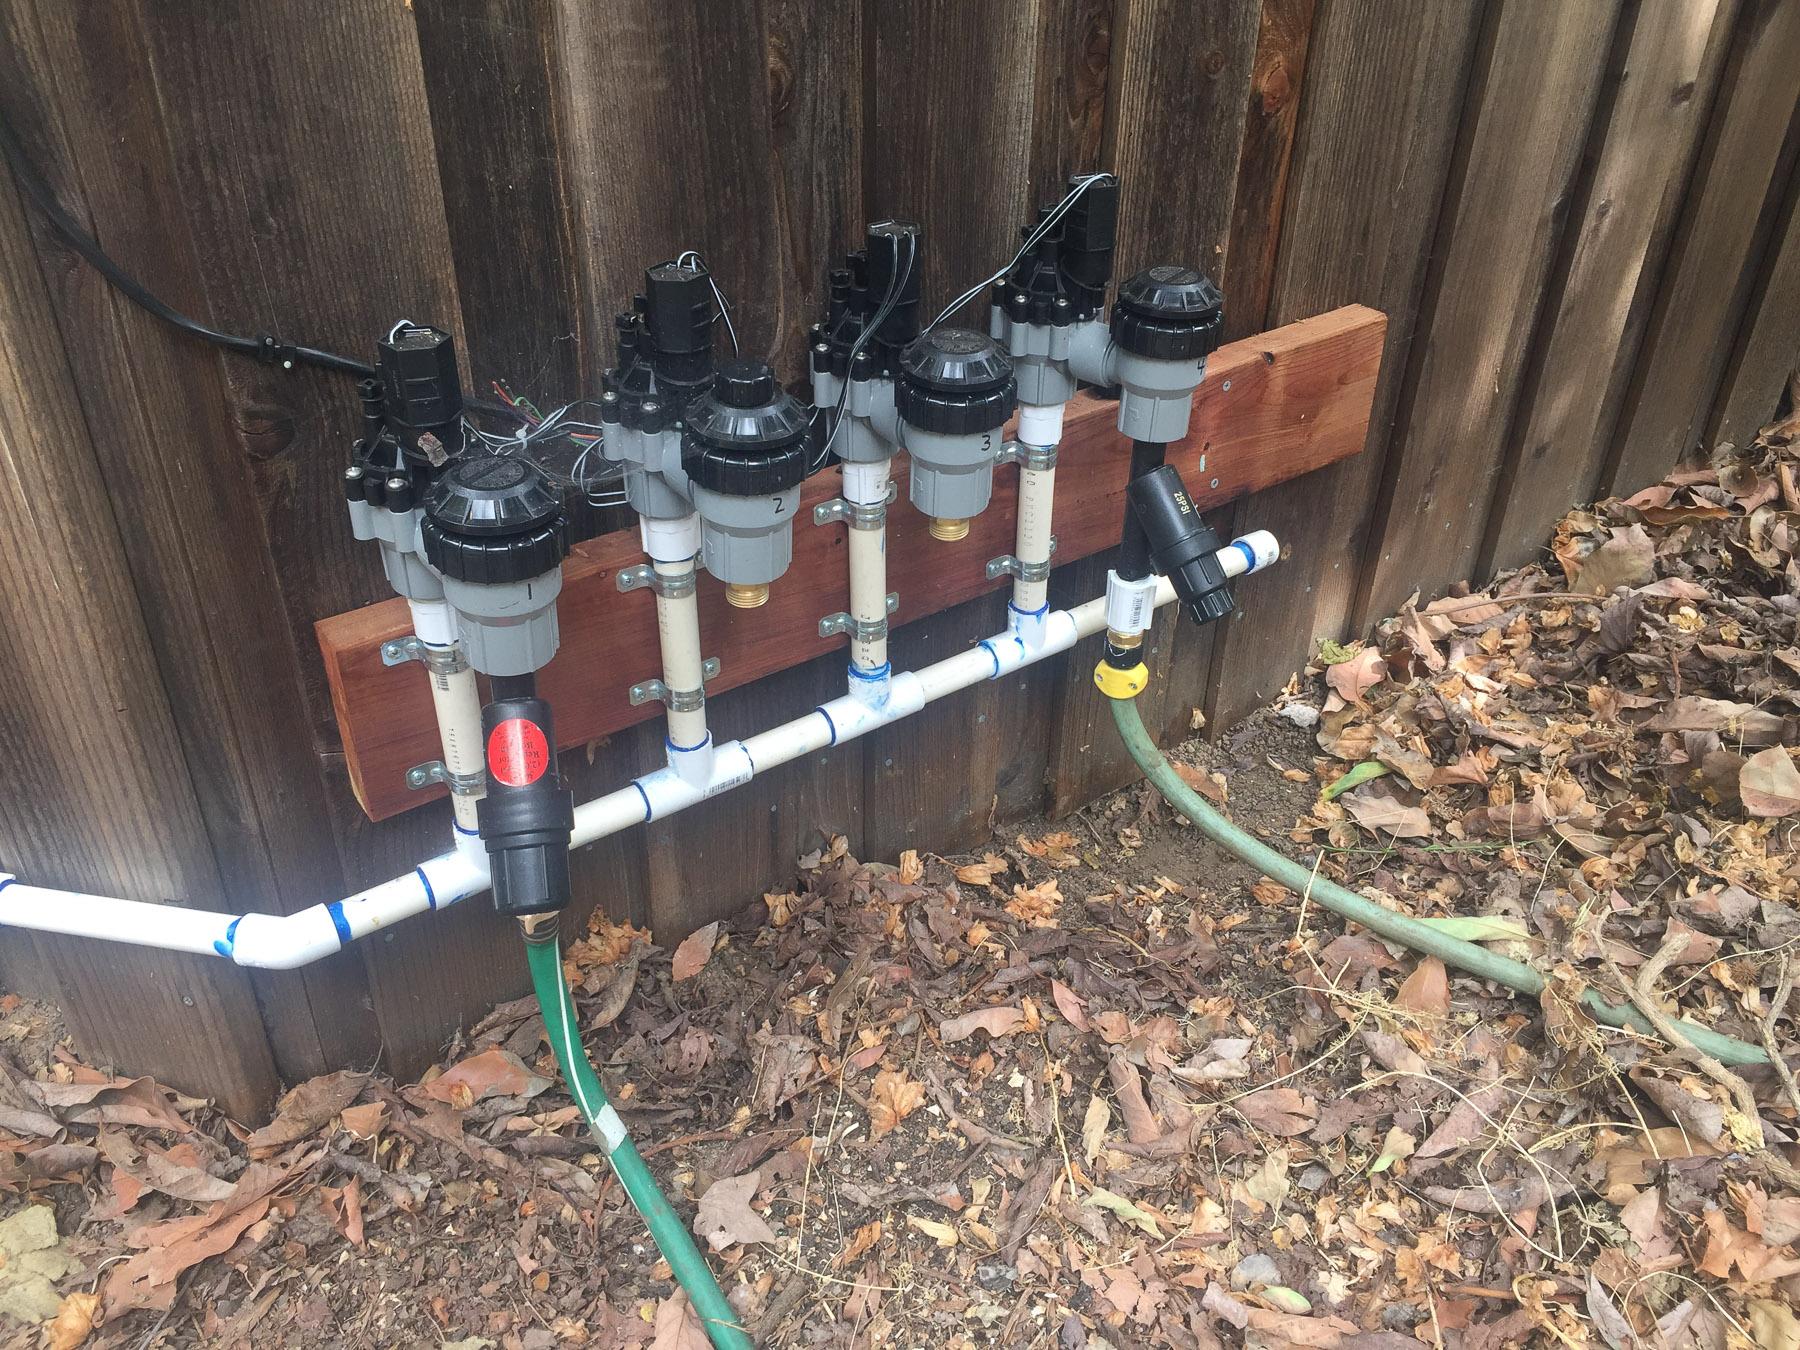 Backyard valves